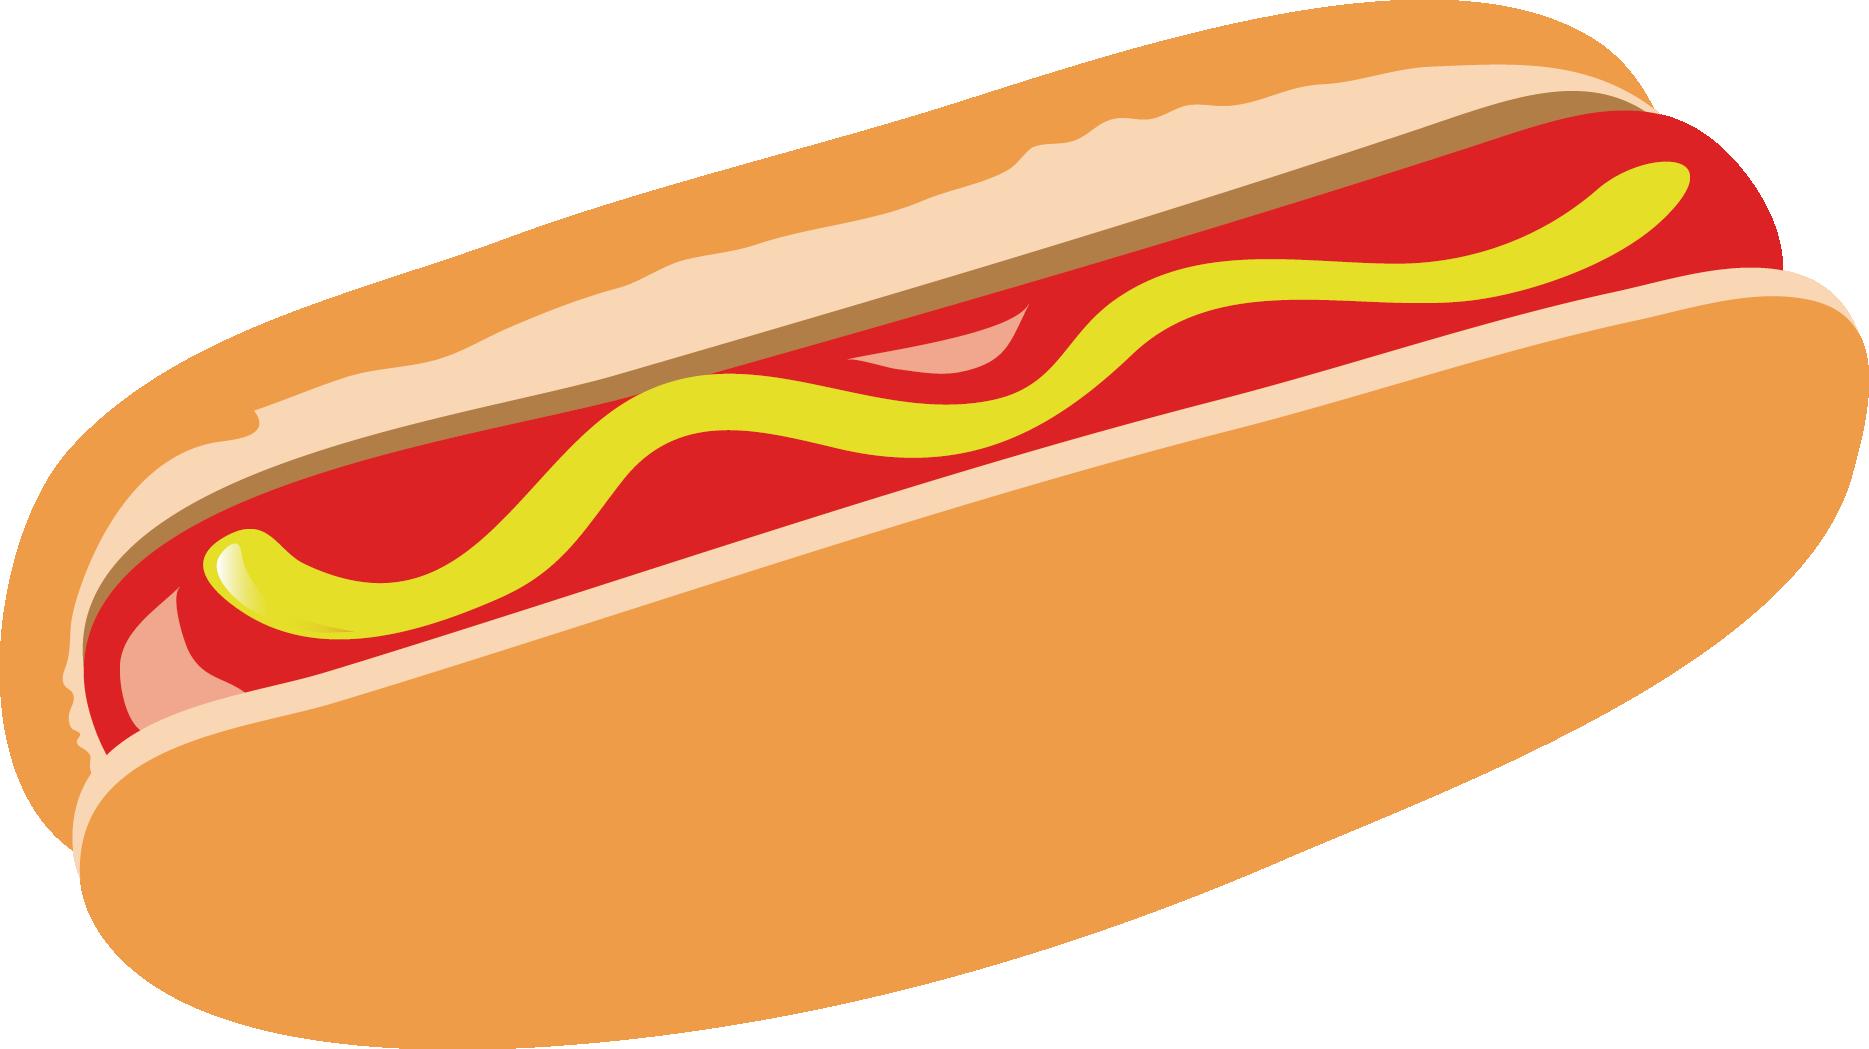 Hamburger hot dog clipart clip art library download Hot dog Breakfast Hamburger Fast food - Ham breakfast 1869*1049 ... clip art library download